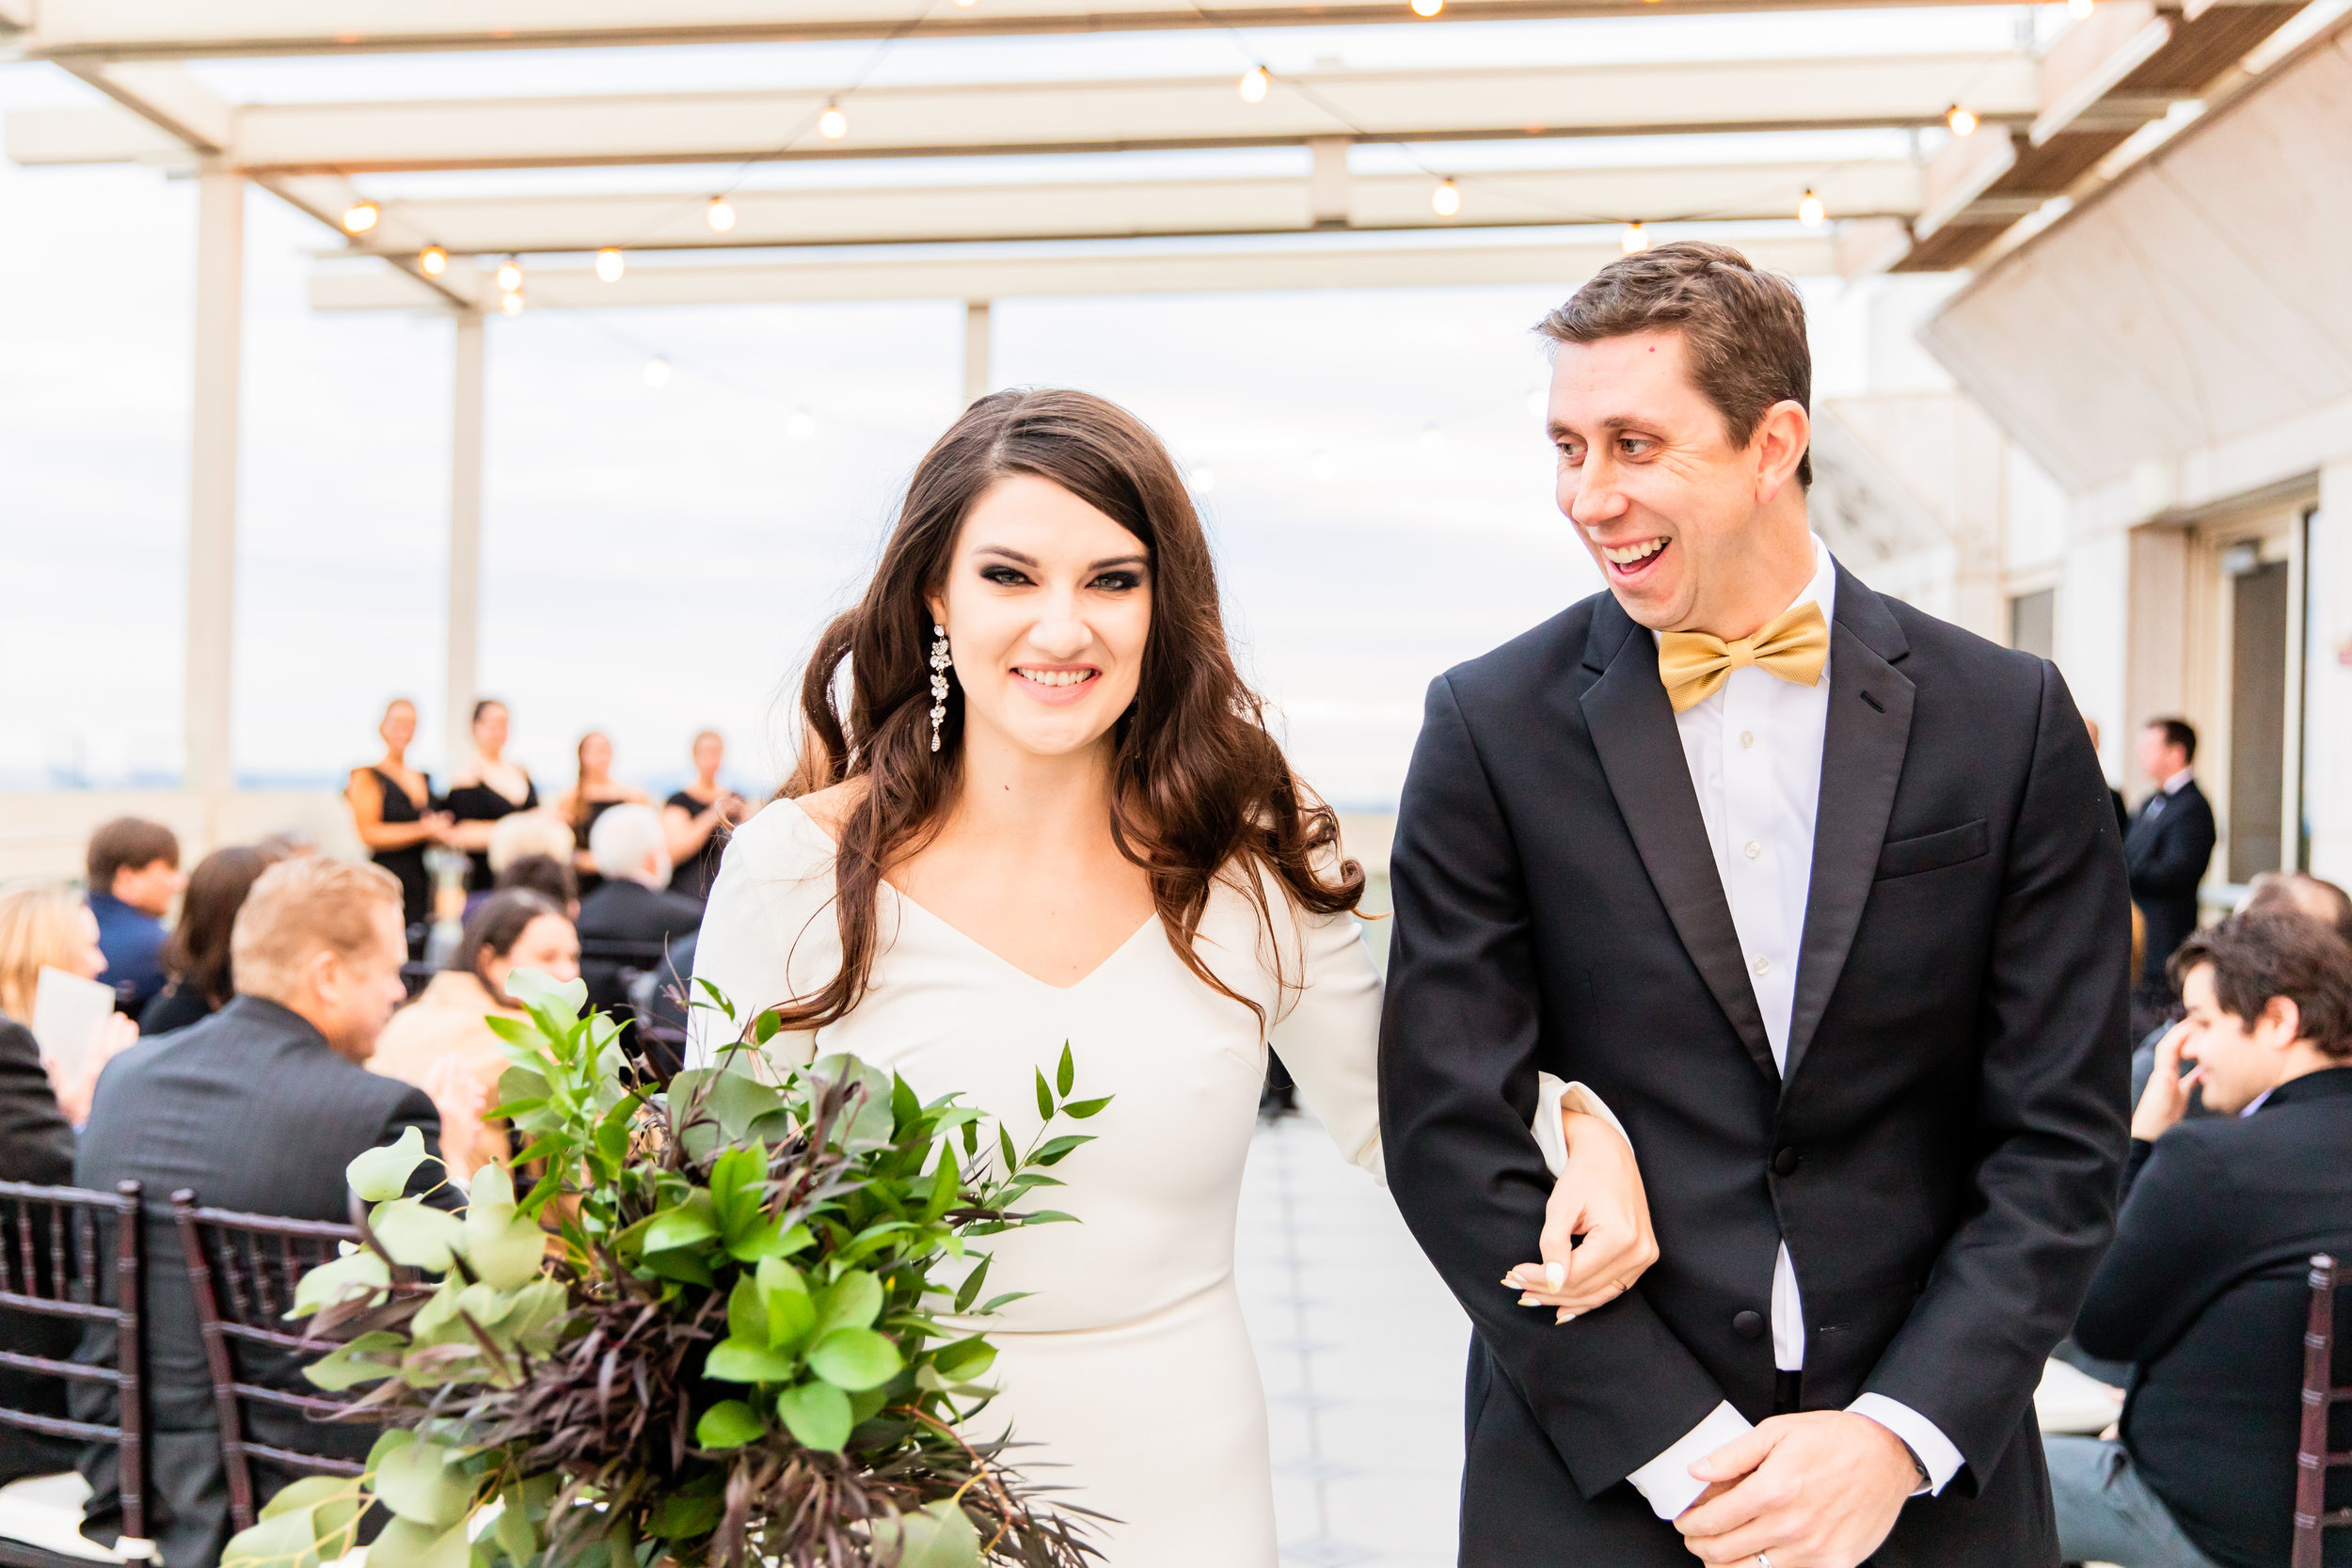 Wedding_Atlanta_Emily_Lester_Photography-631.jpg